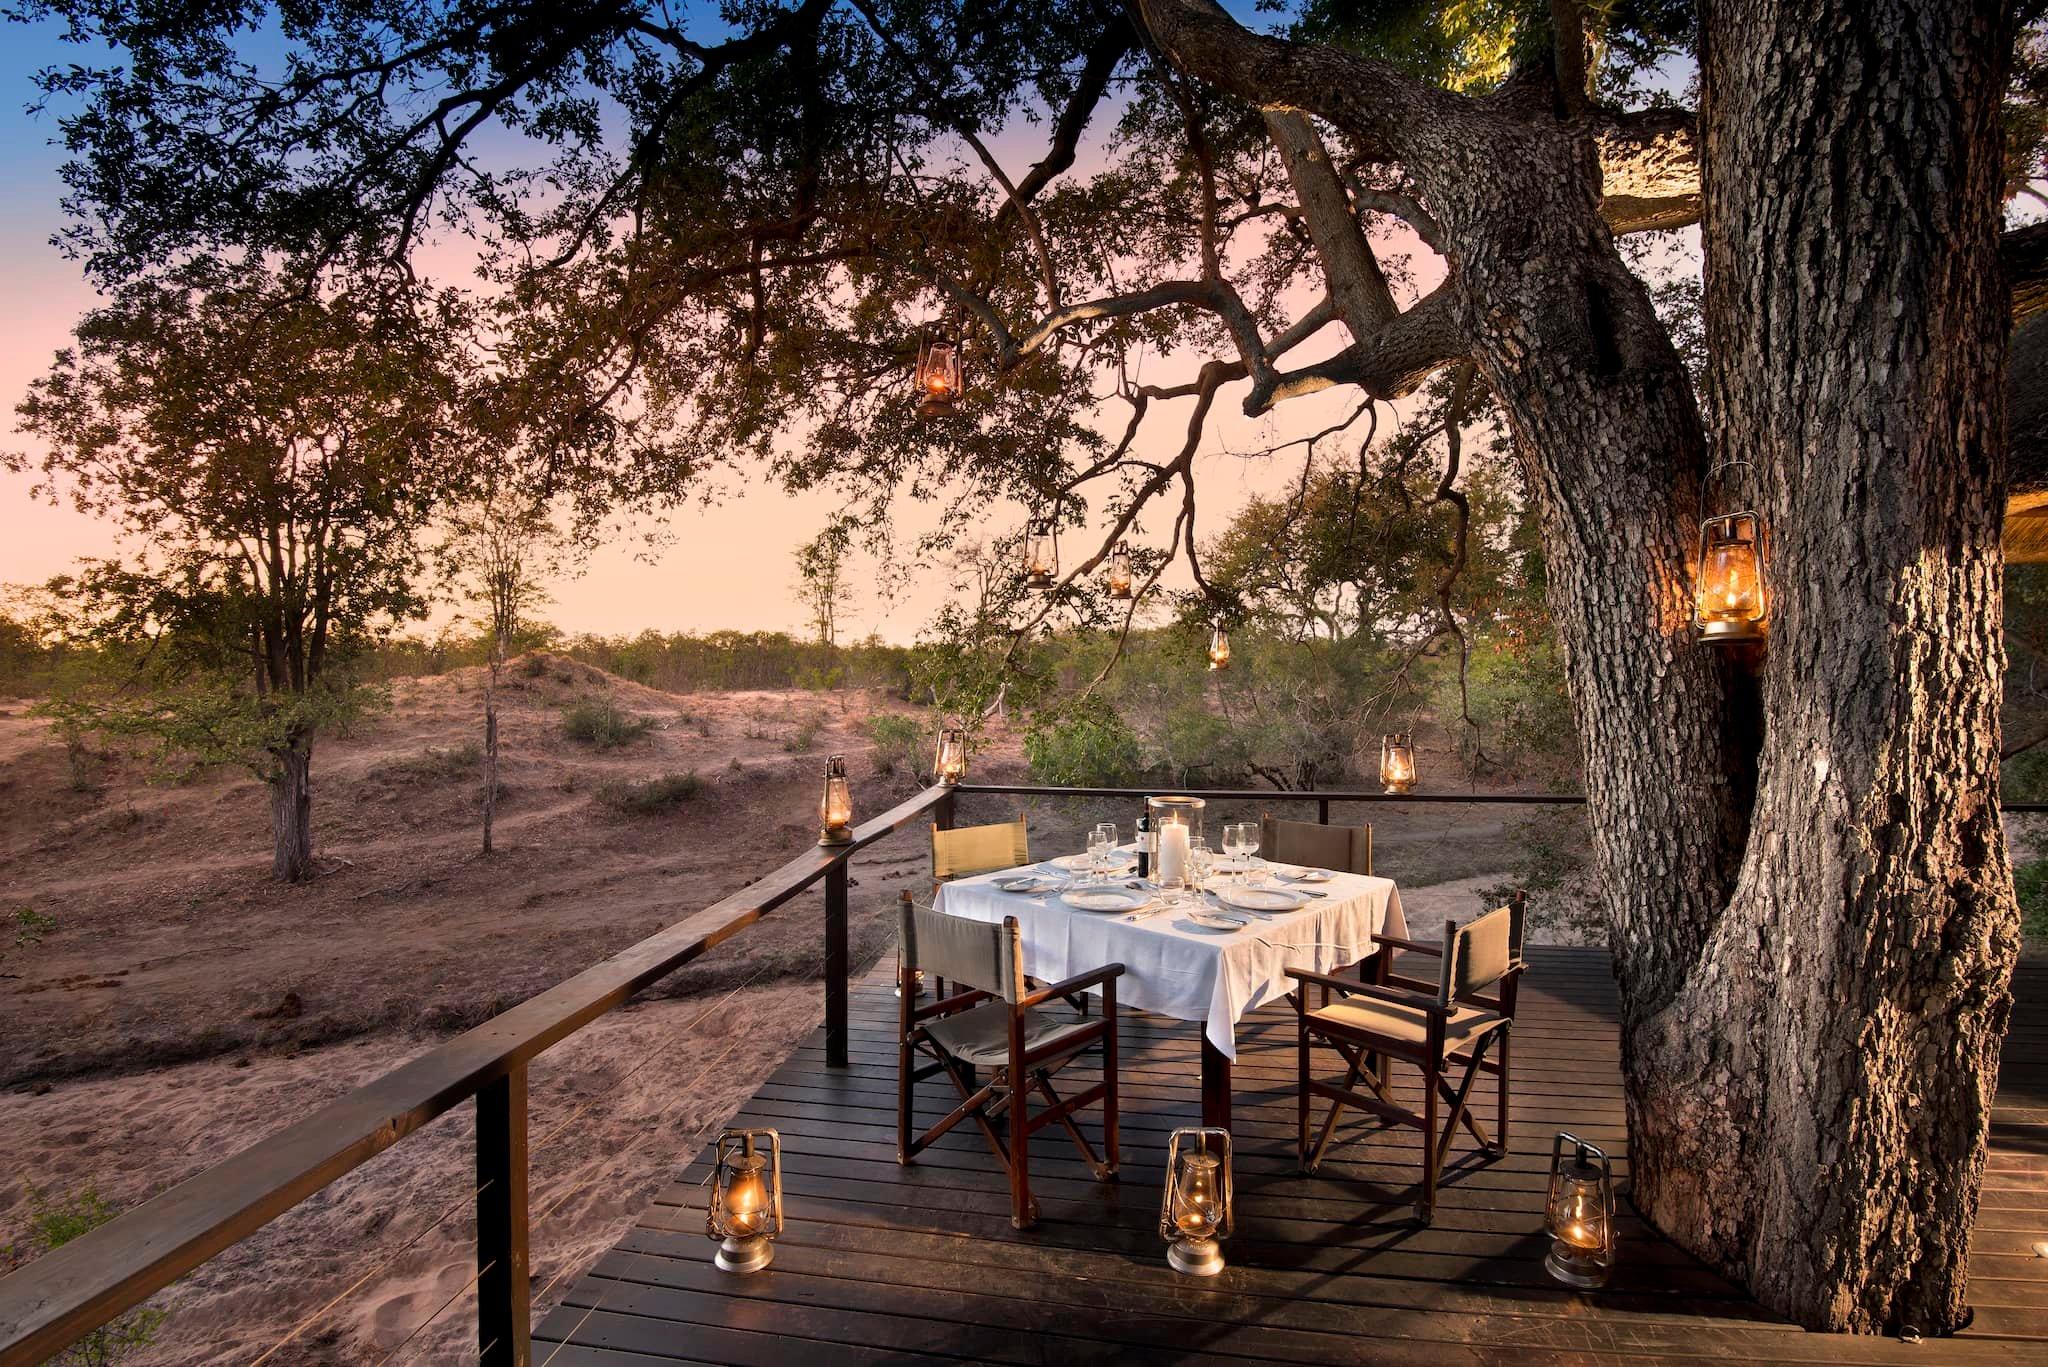 andBeyond-ngala-safari-lodge-exterior-deck-view-family-suite-01.jpeg